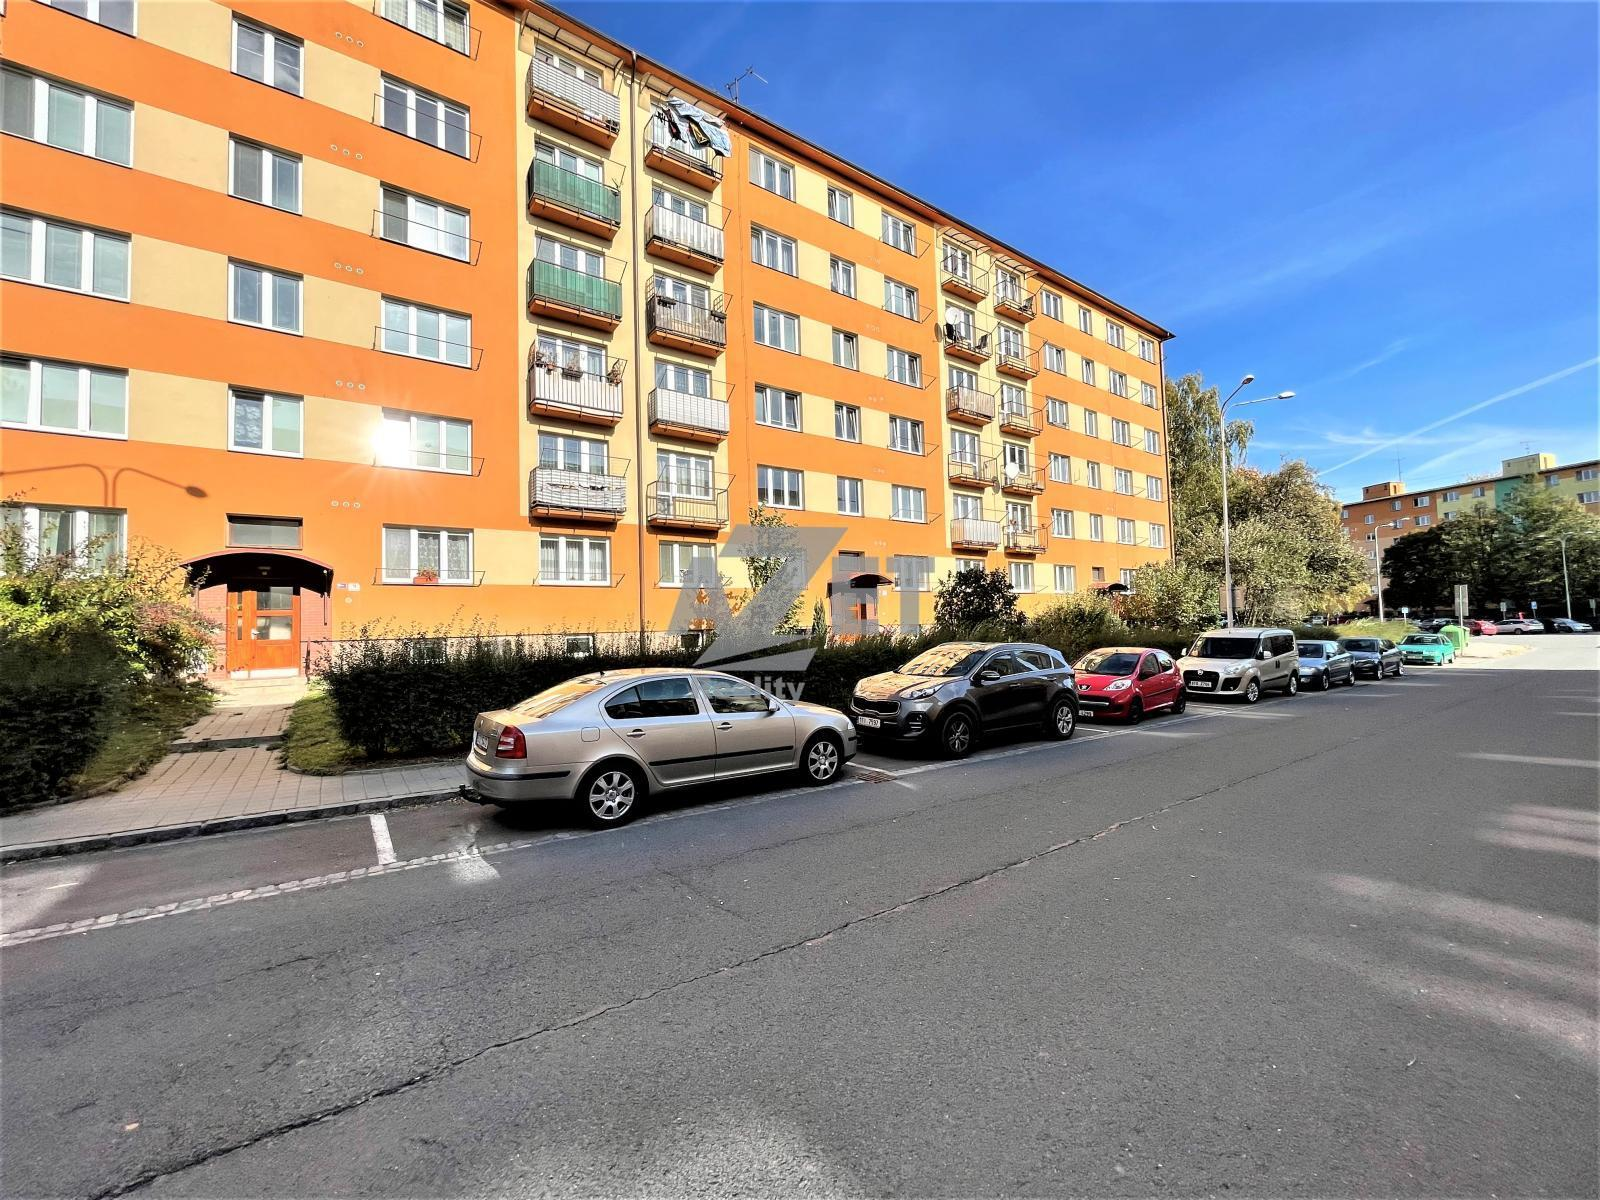 Prodej, byt 2+1, 54 m2, Ostrava-Poruba, ul. Resslova